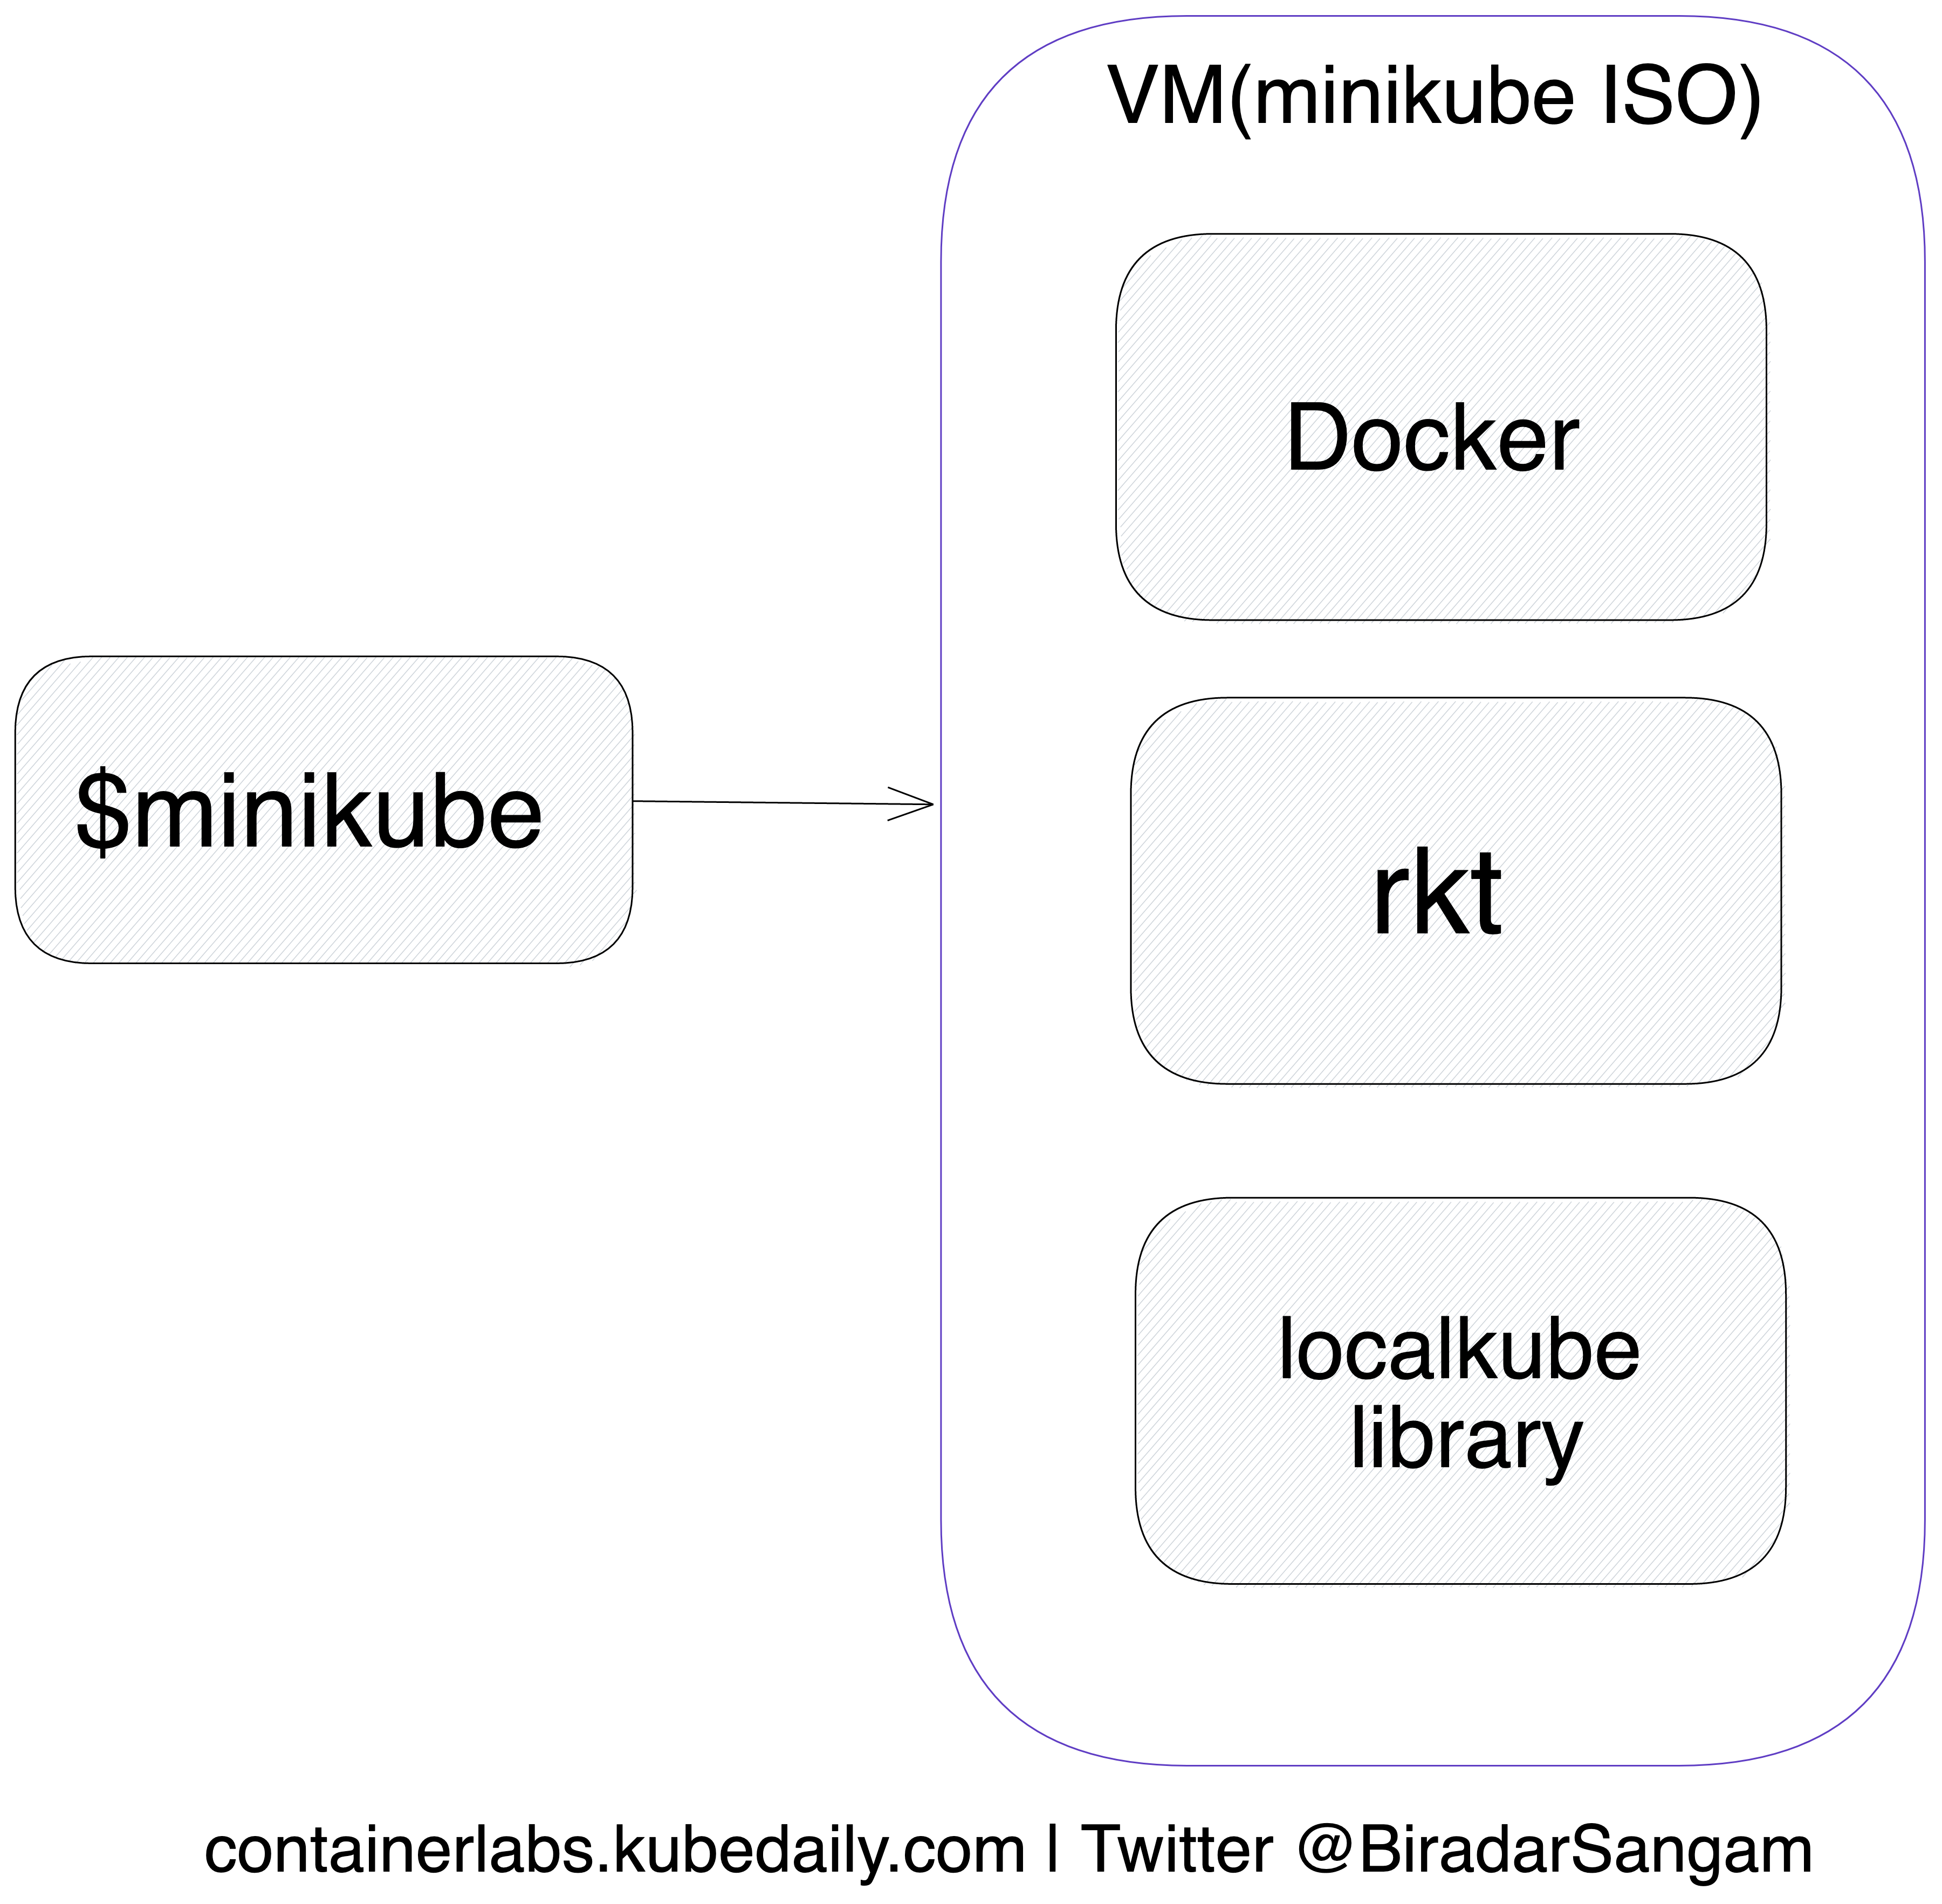 Minikube simplified architecture